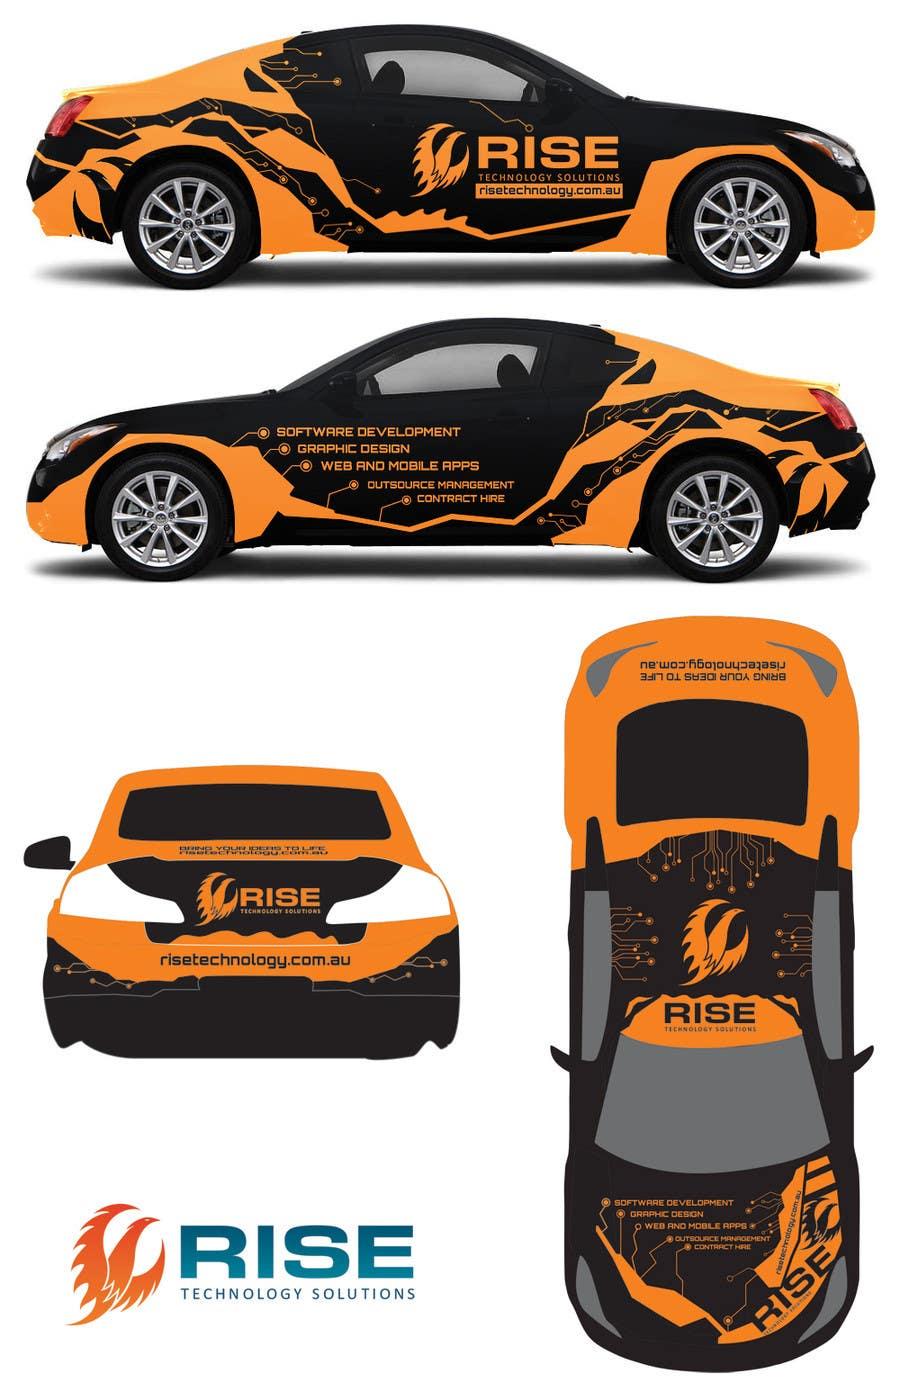 Konkurrenceindlæg #                                        38                                      for                                         Car Wrap Design for RISE Technology Solutions